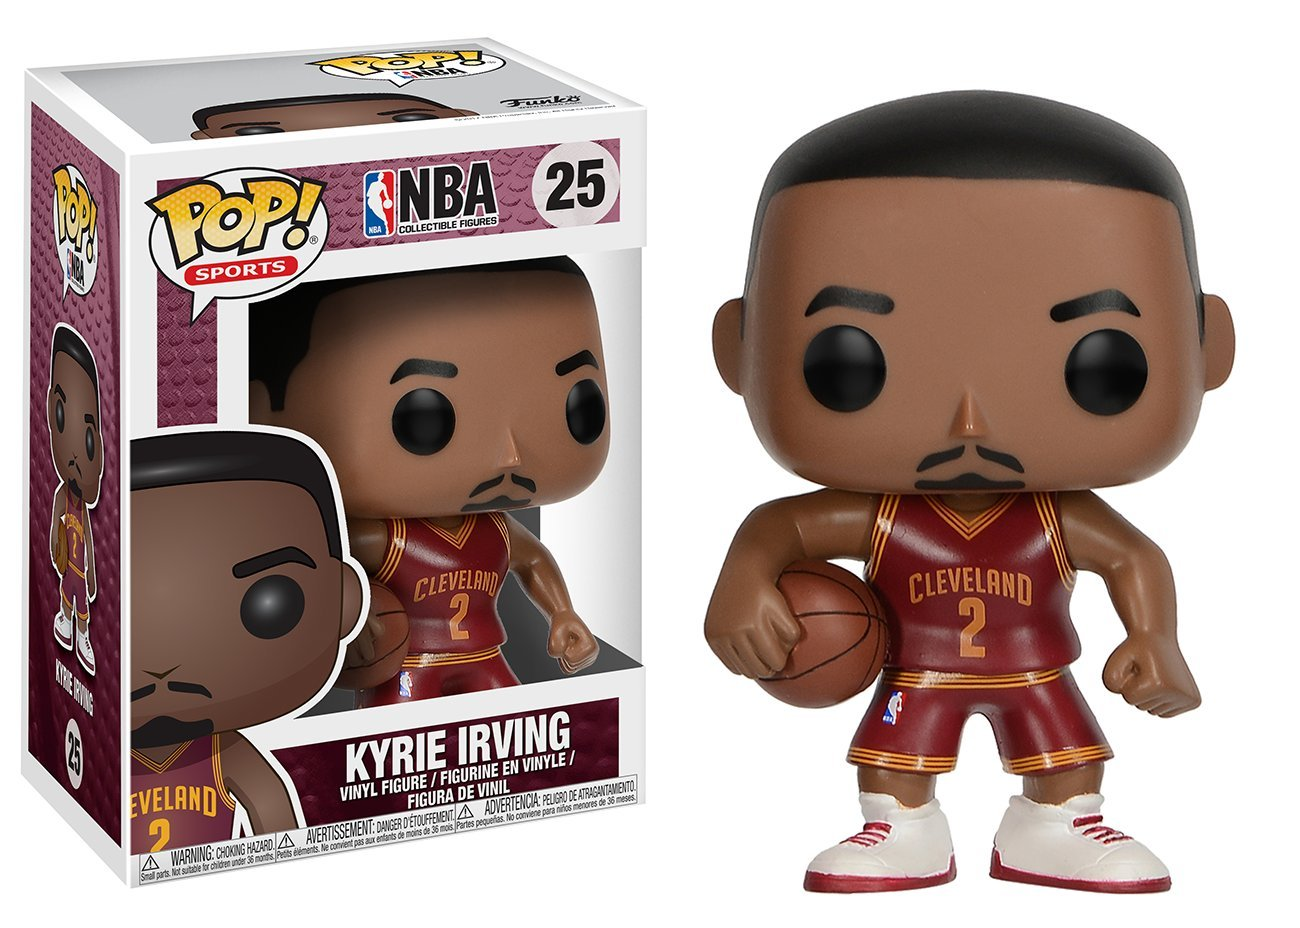 Funko Pop Kyrie Irving Cleveland Cavaliers camiseta roja (NBA 25) Funko Pop NBA